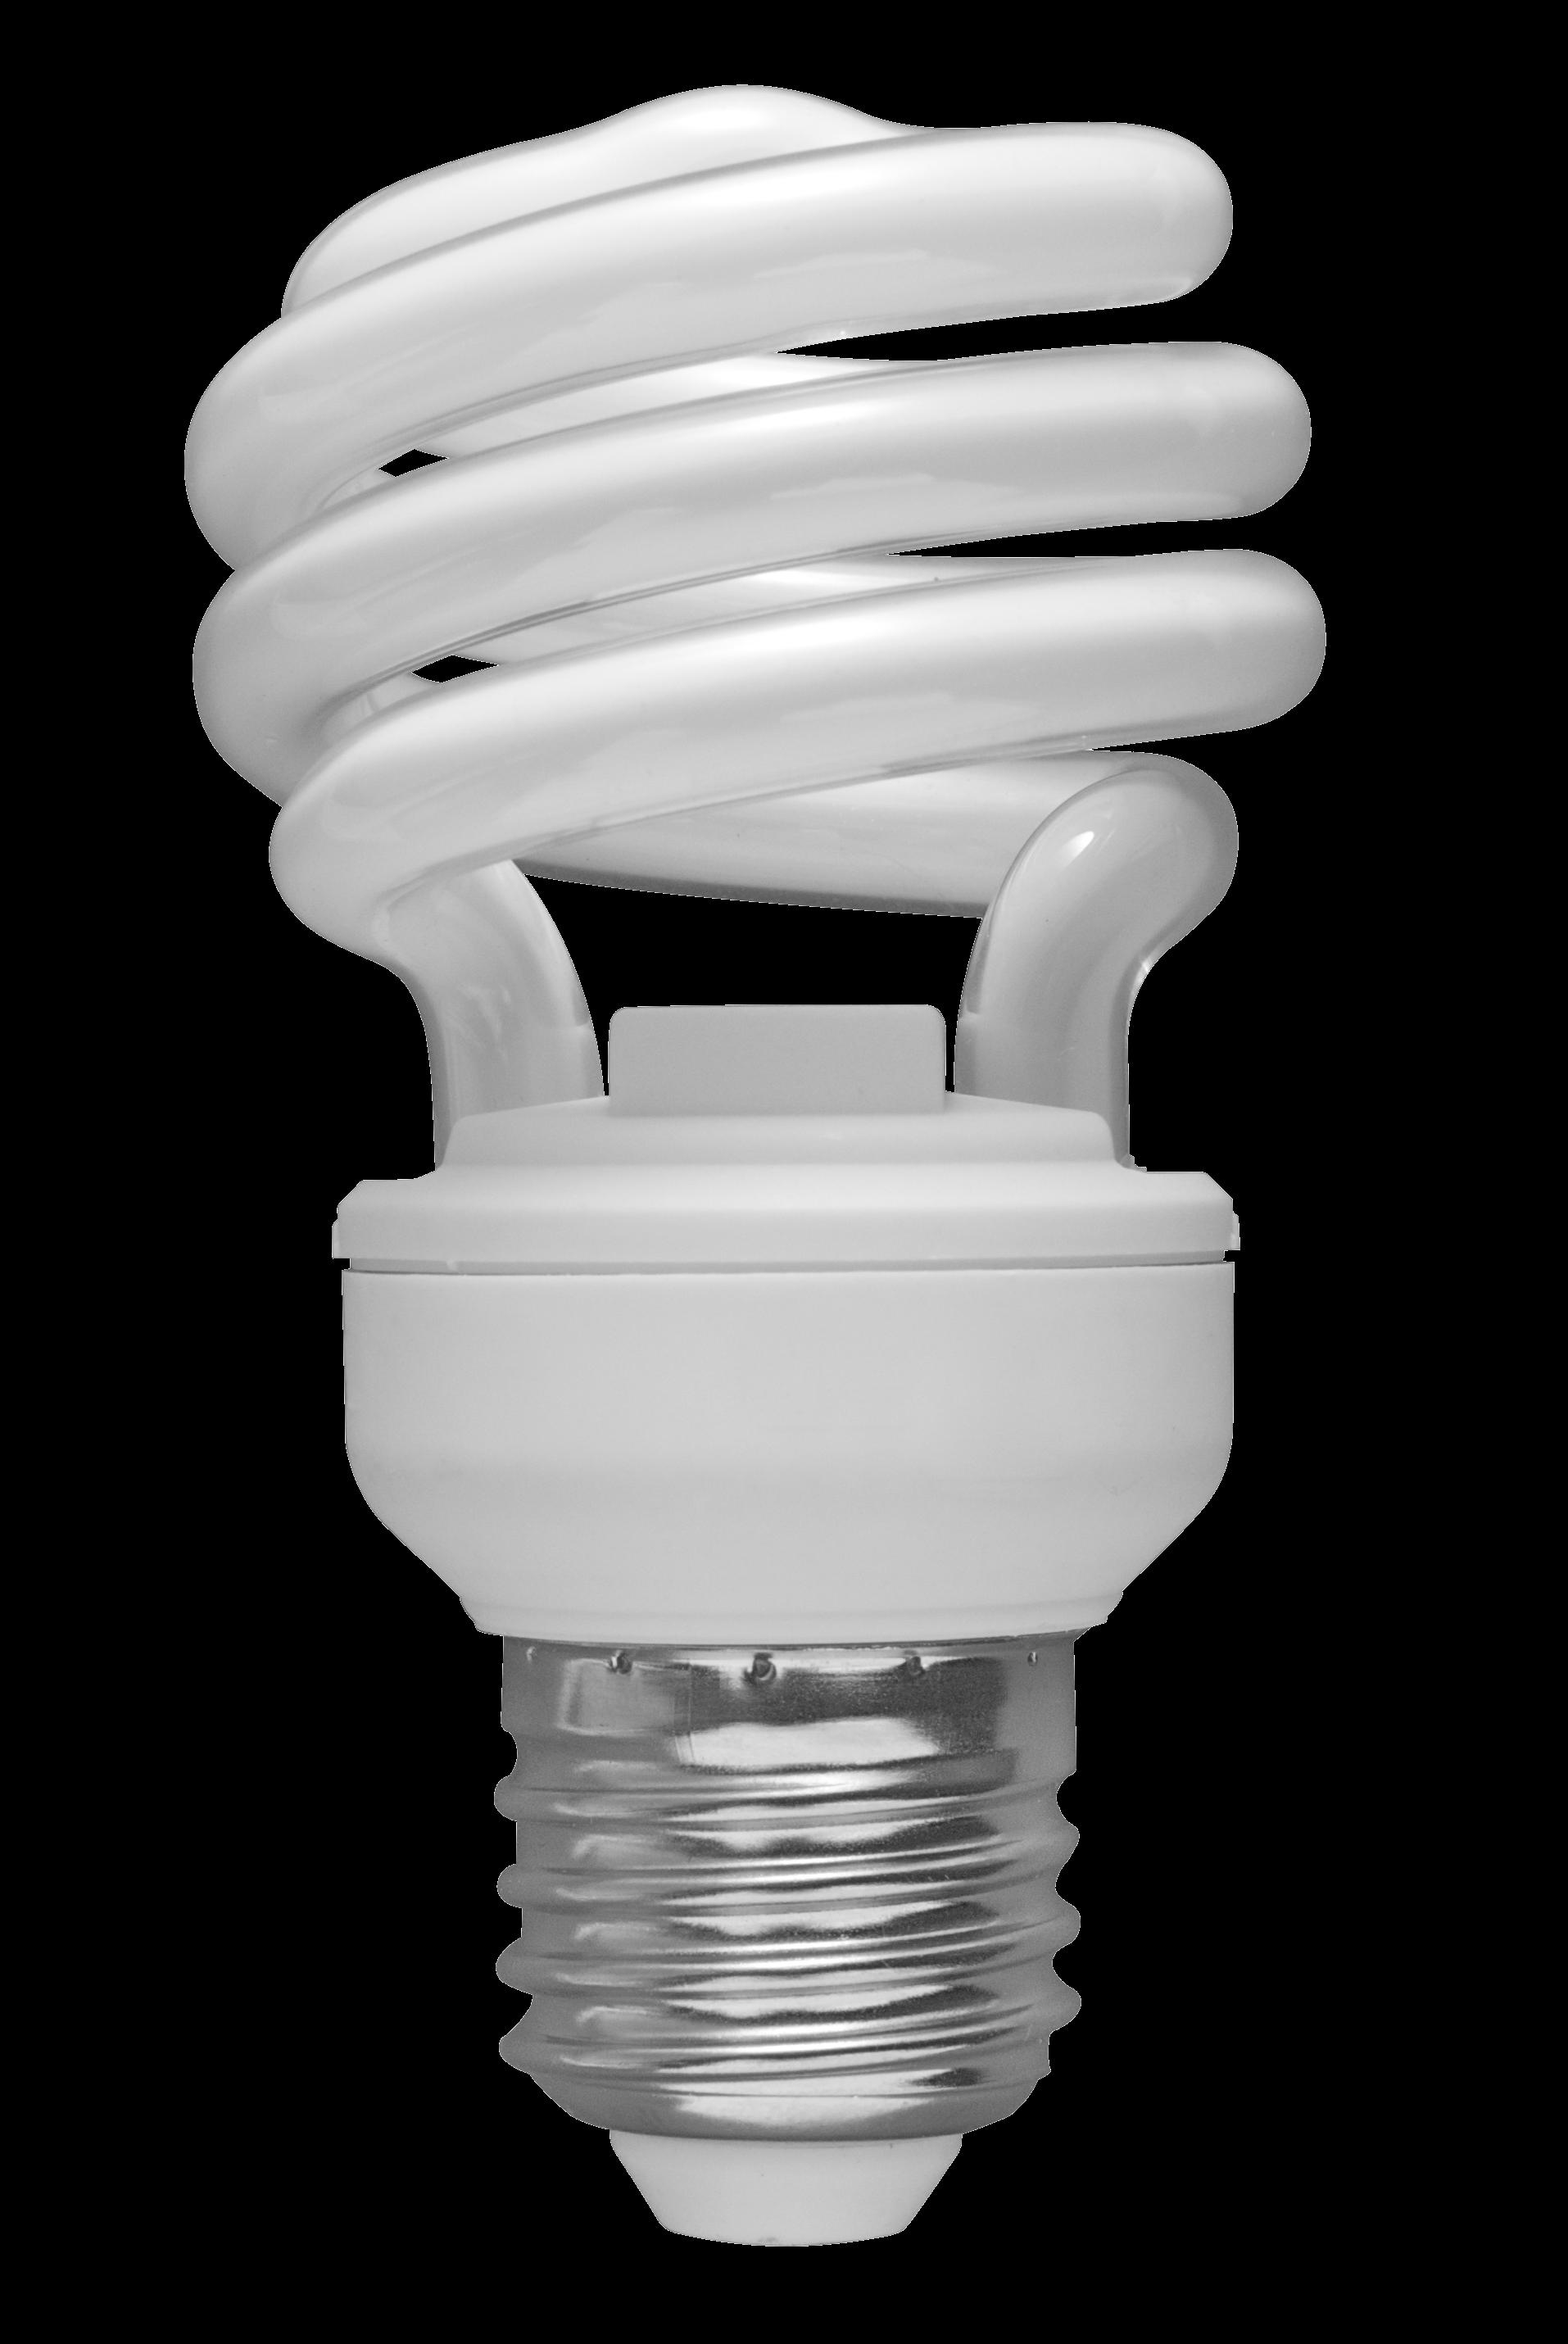 Lightbulb HD PNG - 118945